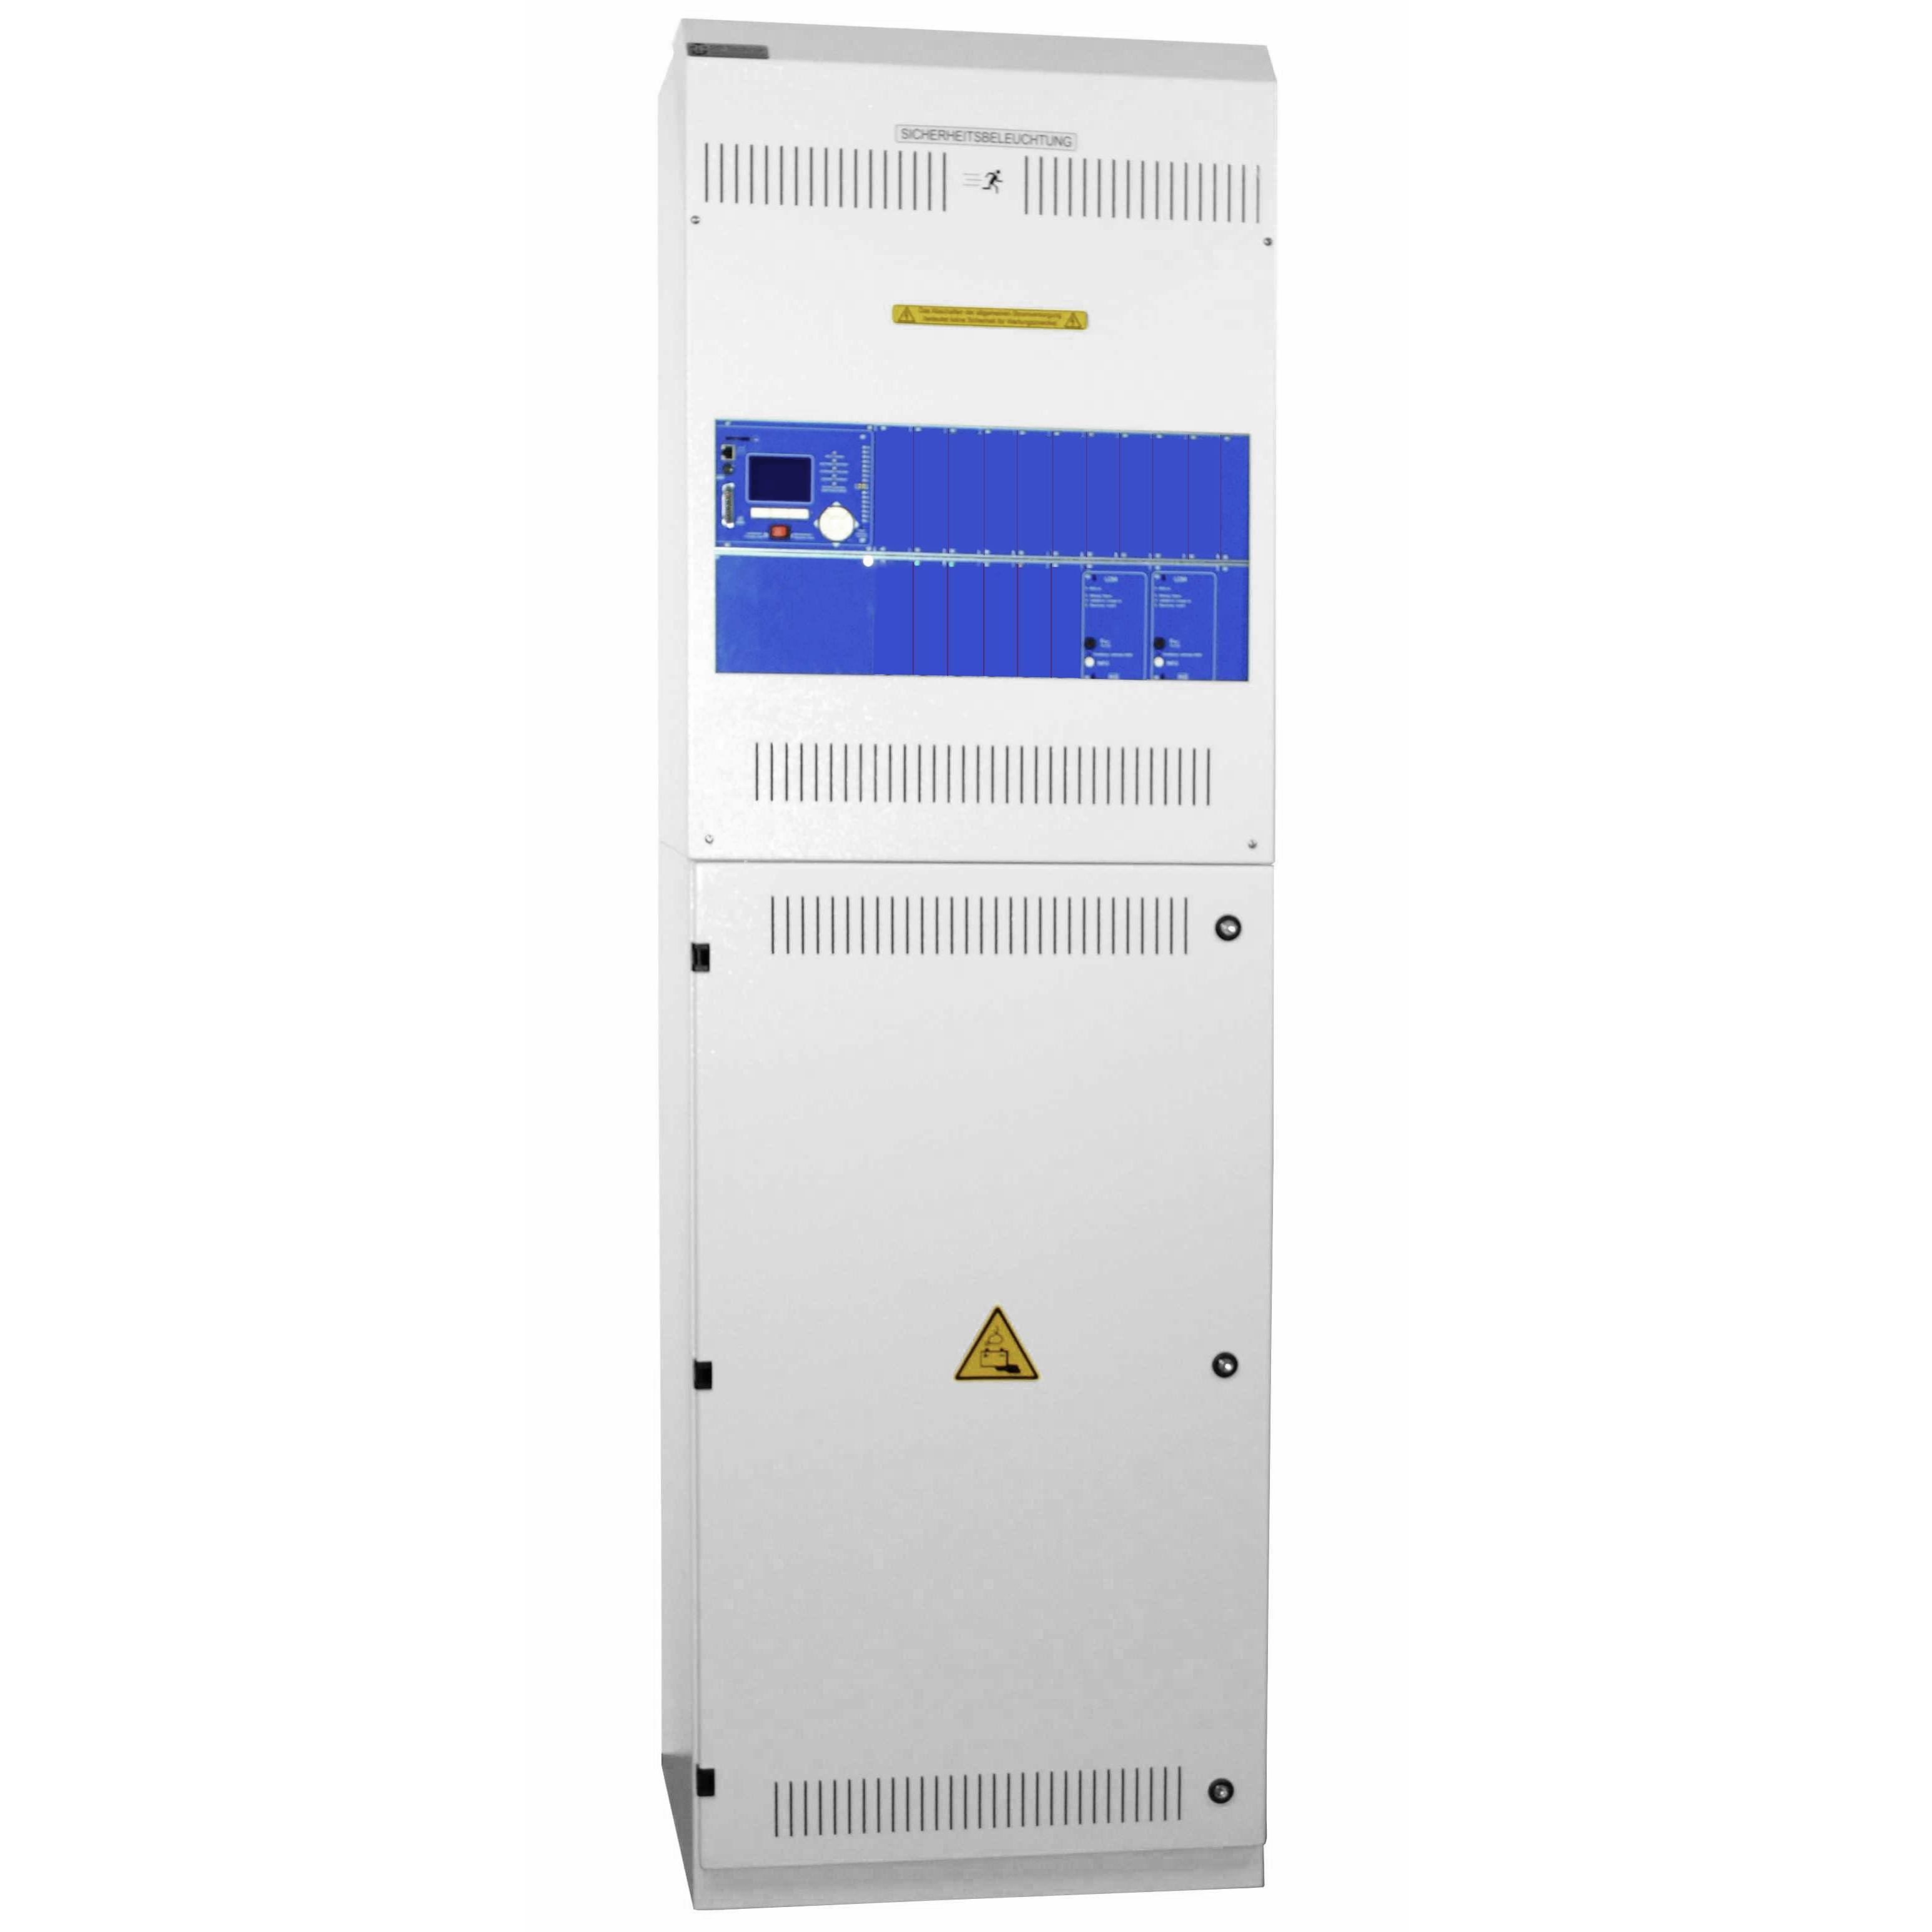 Zentralbatterieanlage MidiControl, 32/5A, ohne DCM